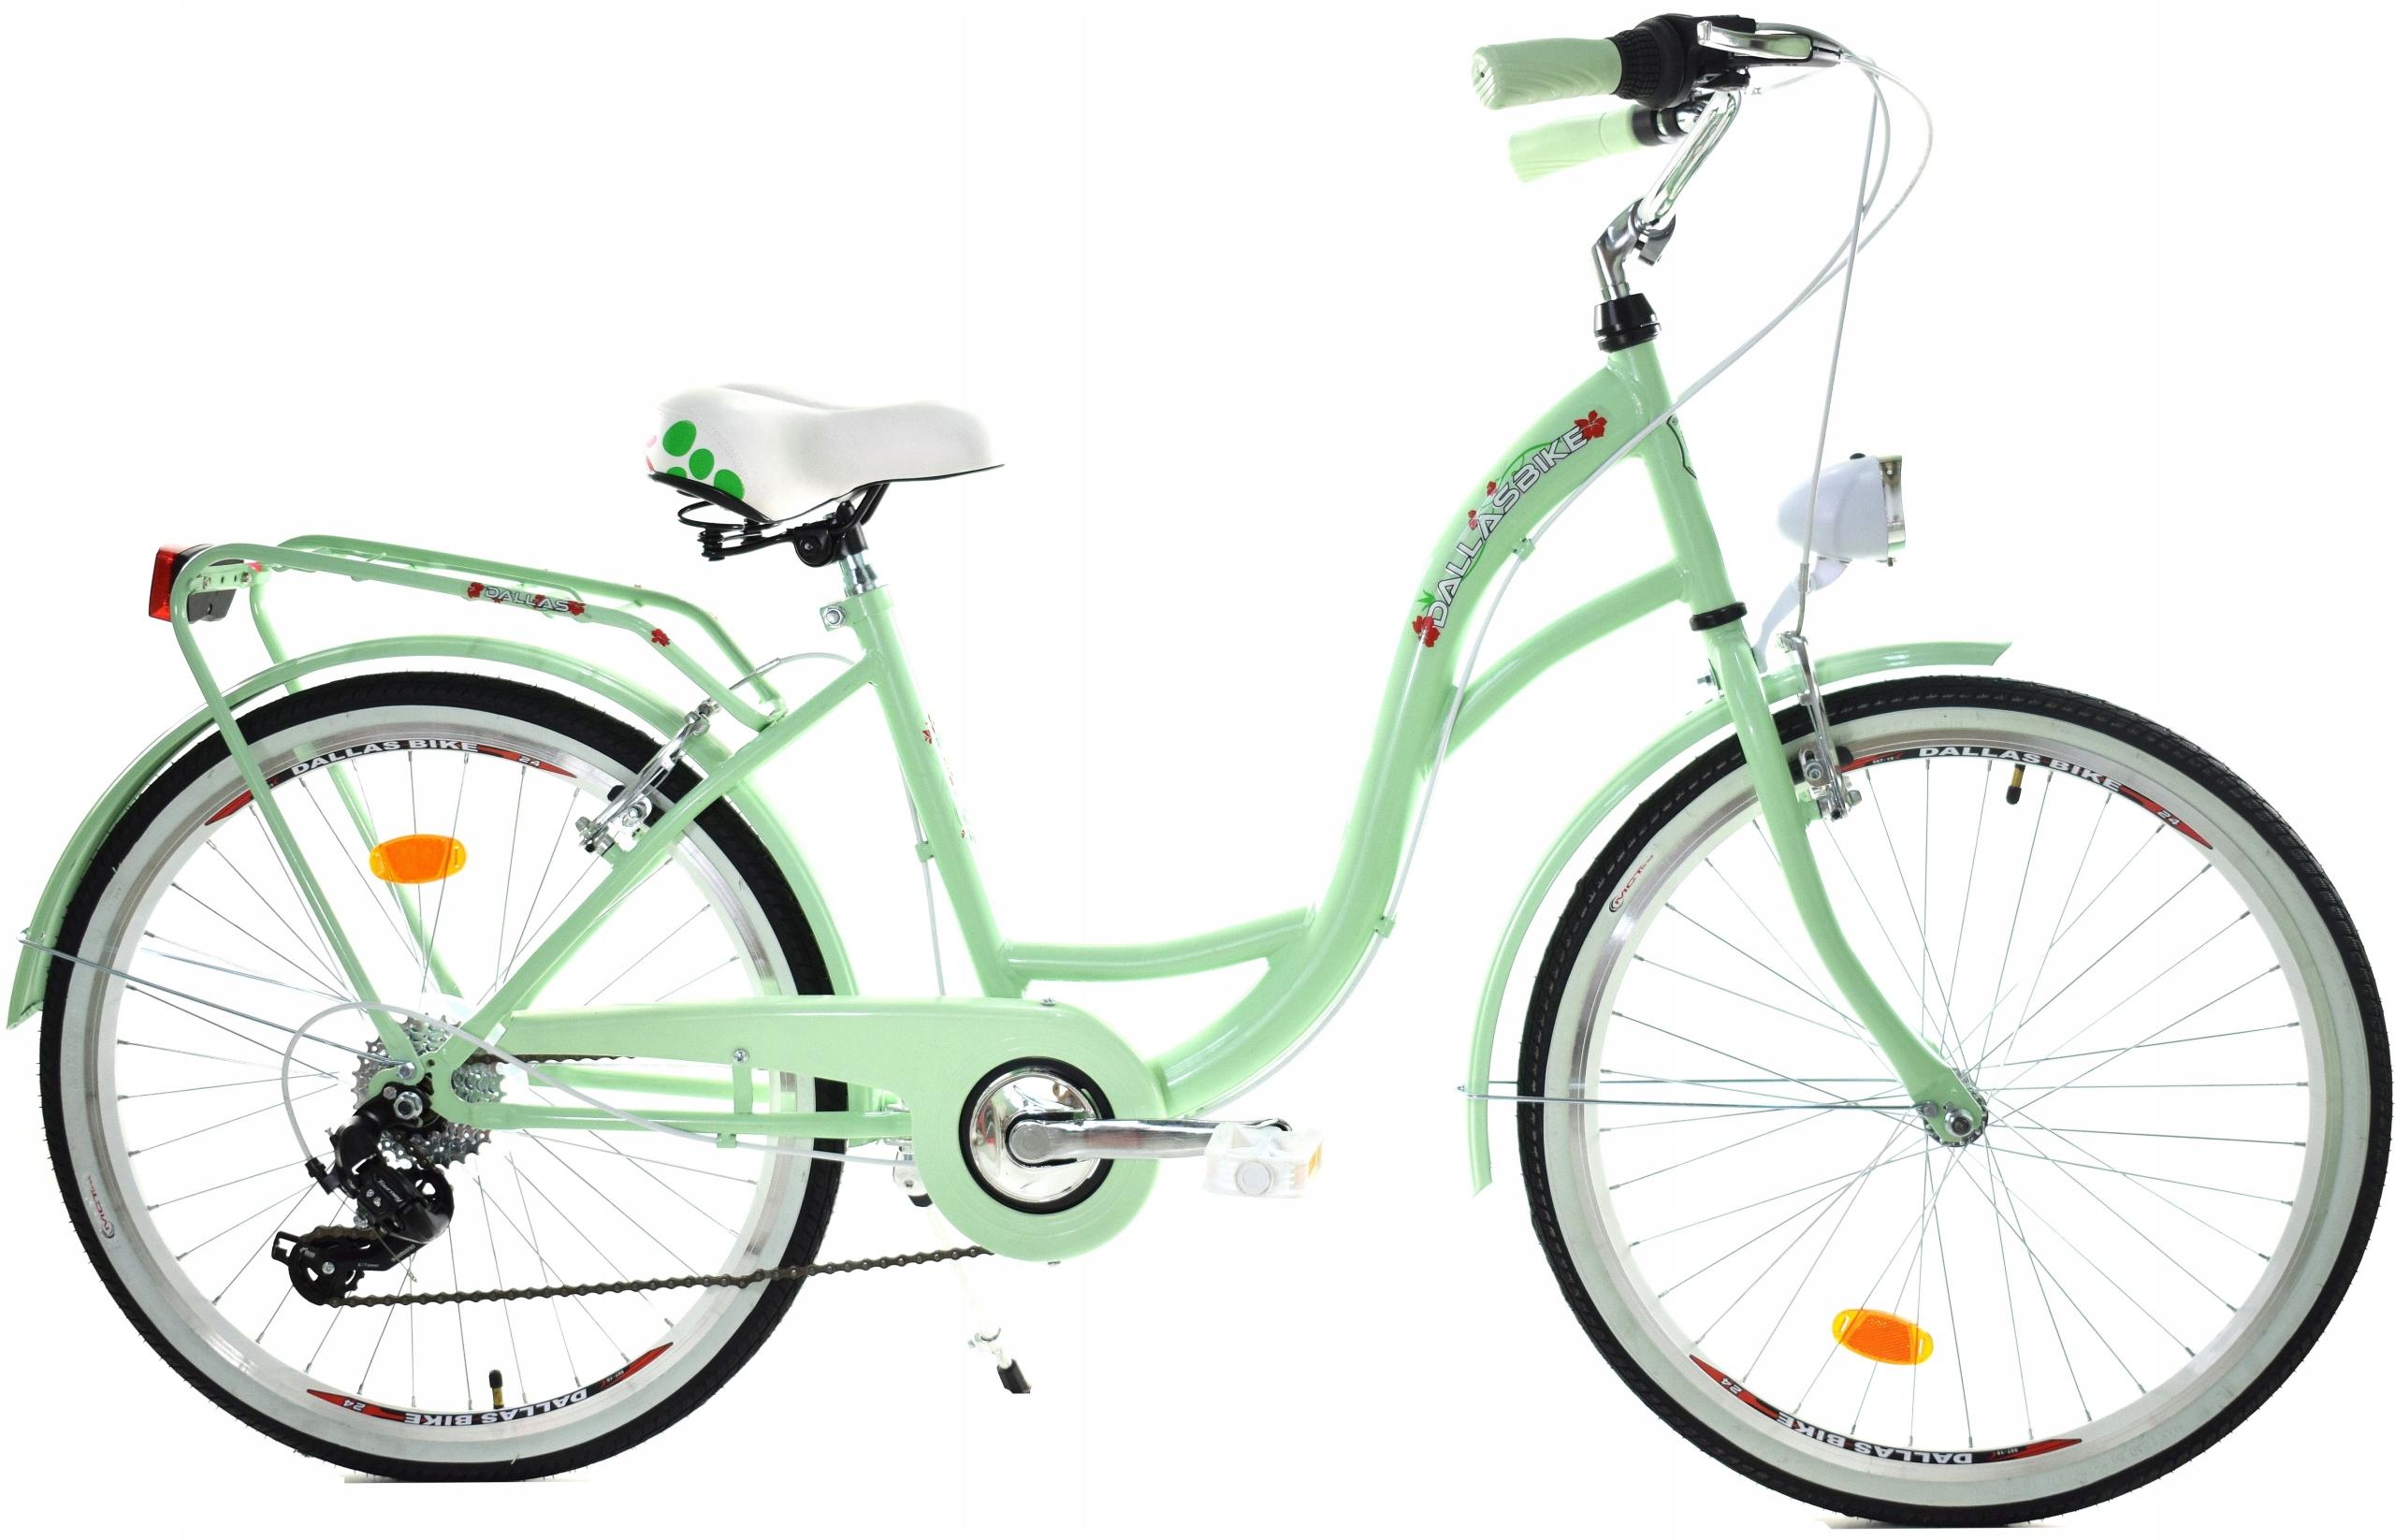 Bicykel pre dievča 26 beží Dallasom na Communion od Mark Dallas Bike